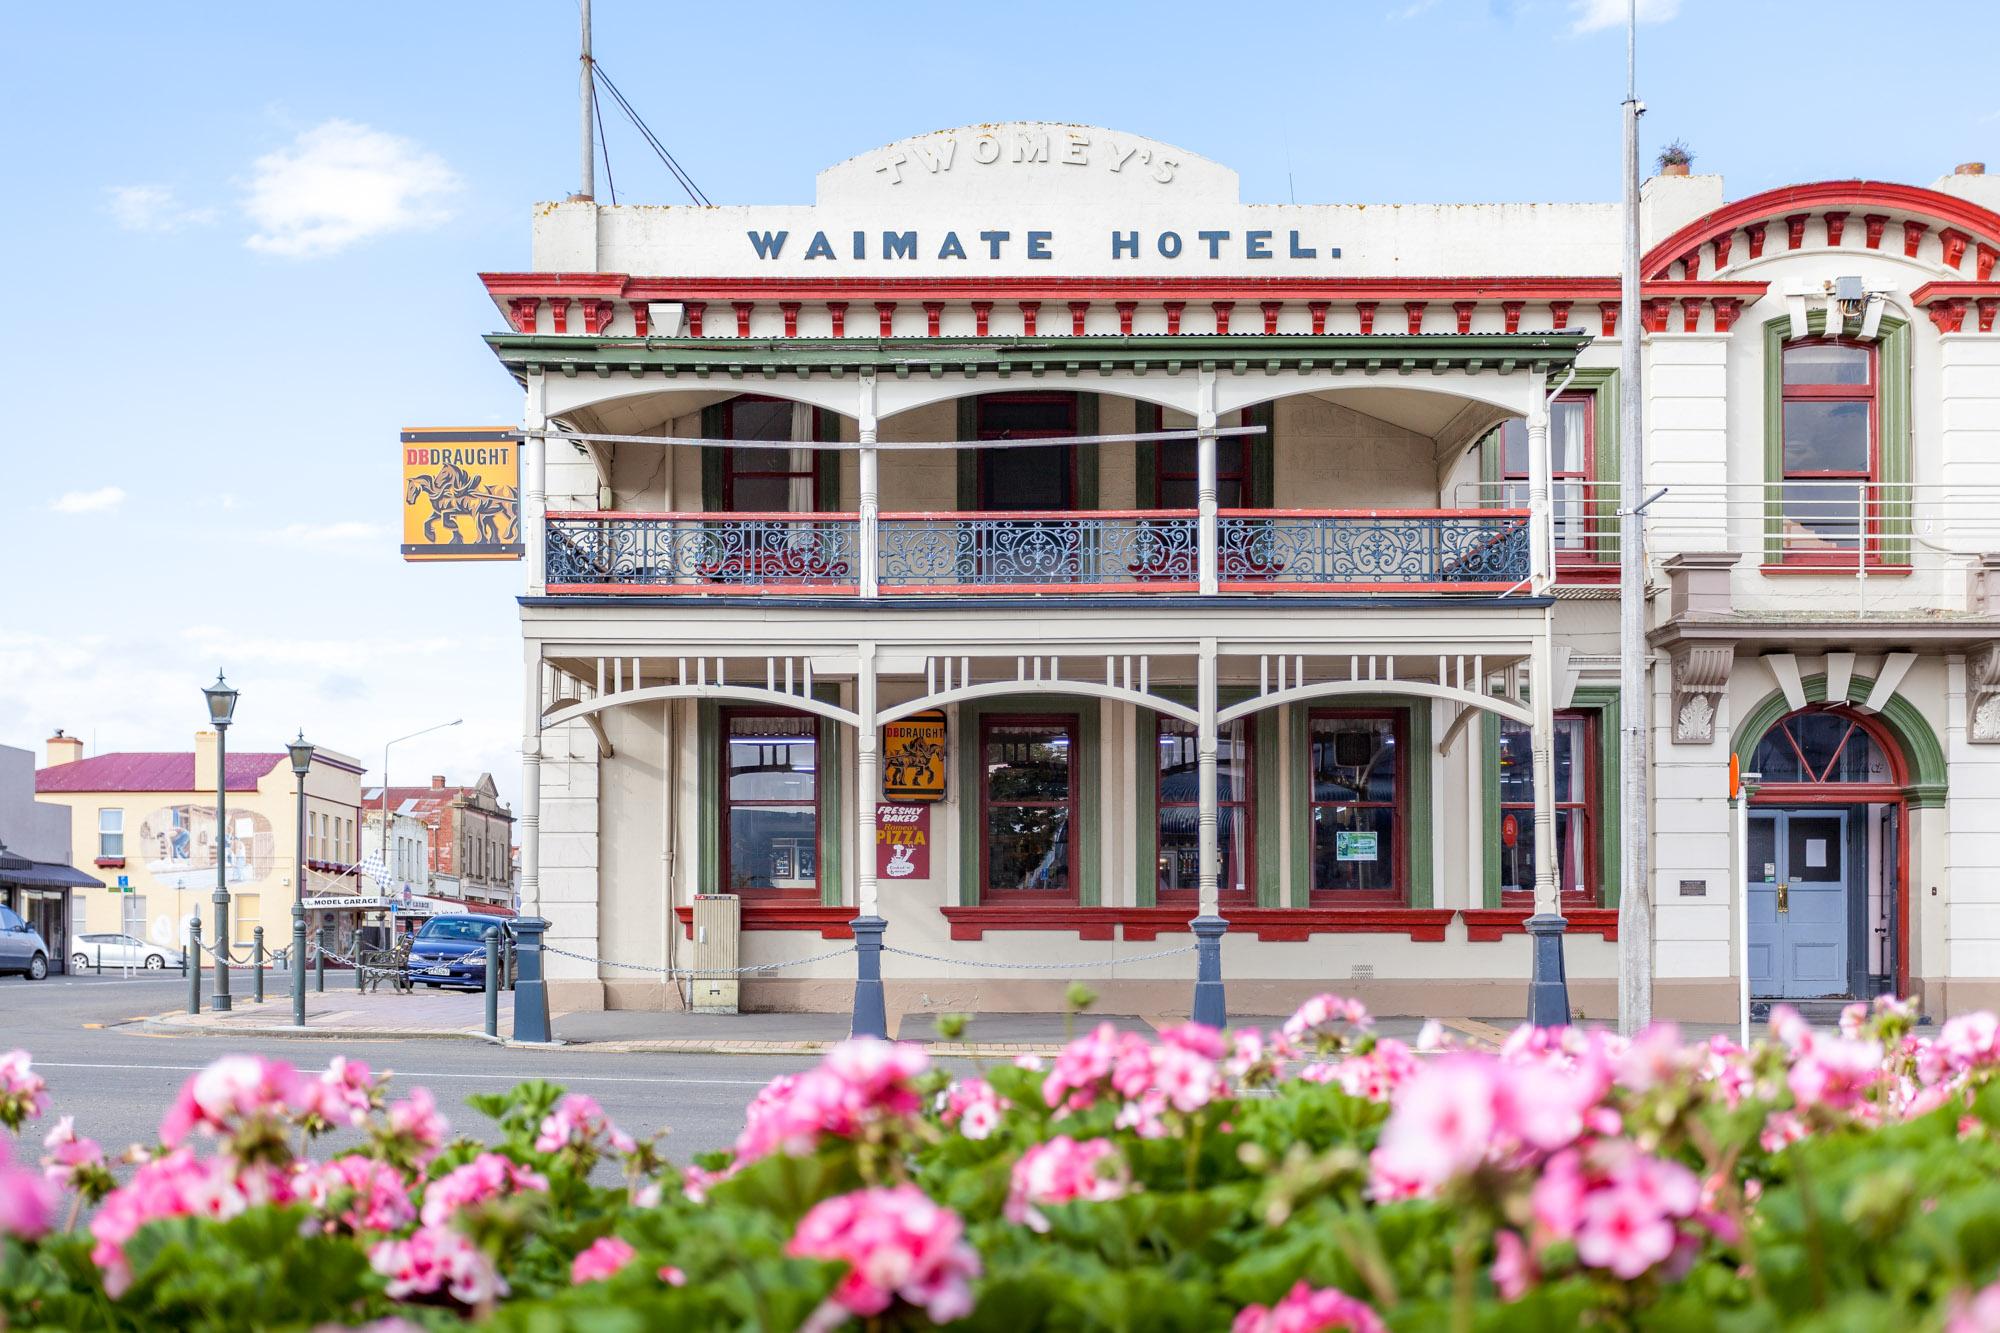 Waimate Hotel